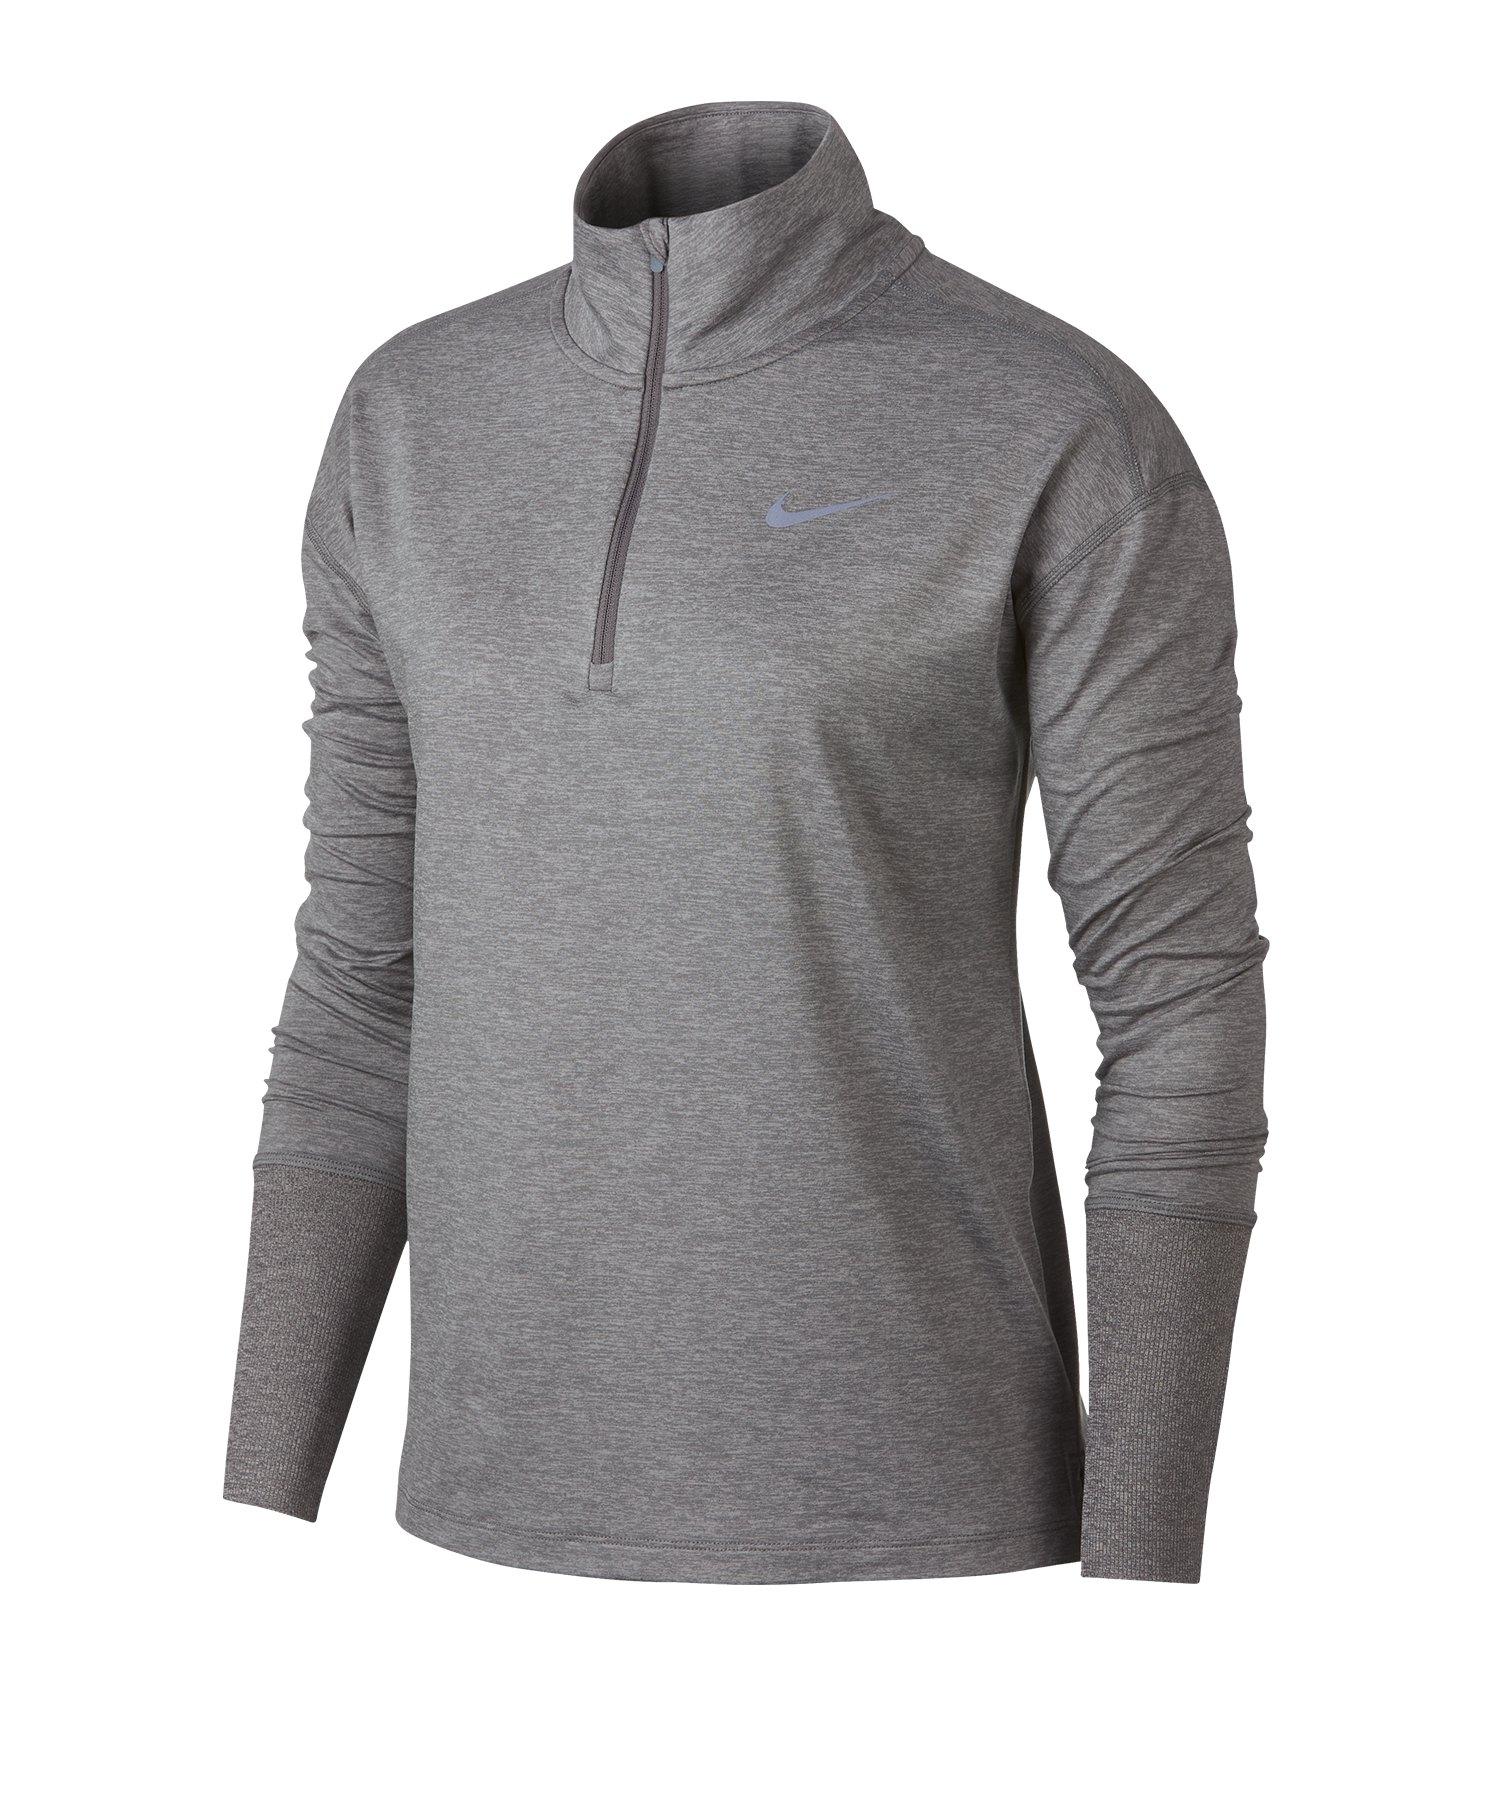 Nike Element 1/2 Zip Top Running Damen Grau F036 - grau